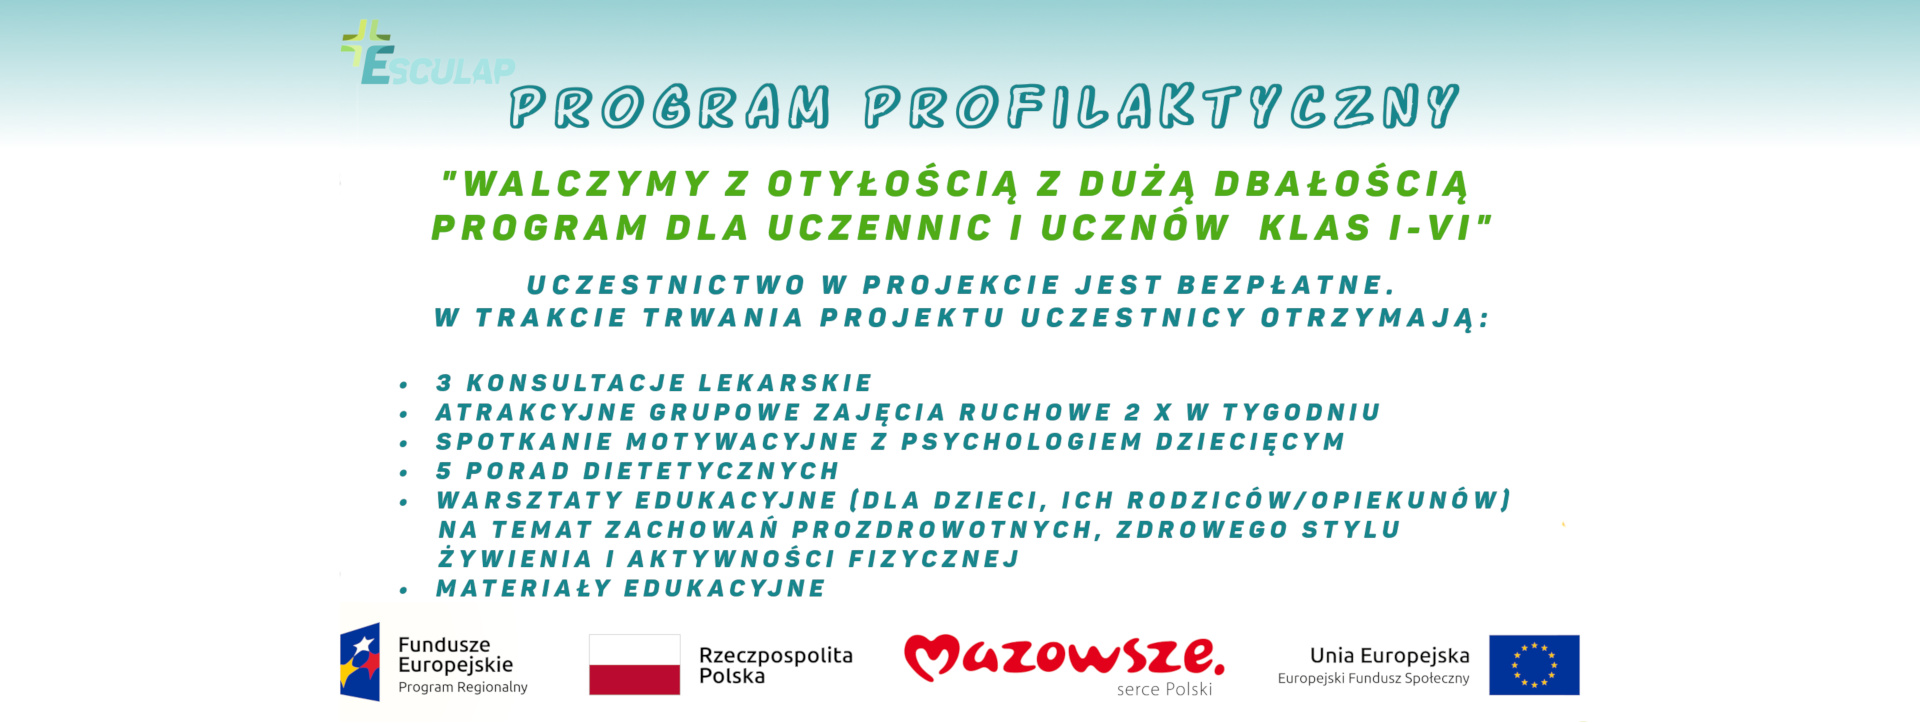 https://esculap-przychodnia.pl/wp-content/uploads/2019/03/00-Baner-Otylosc.jpg